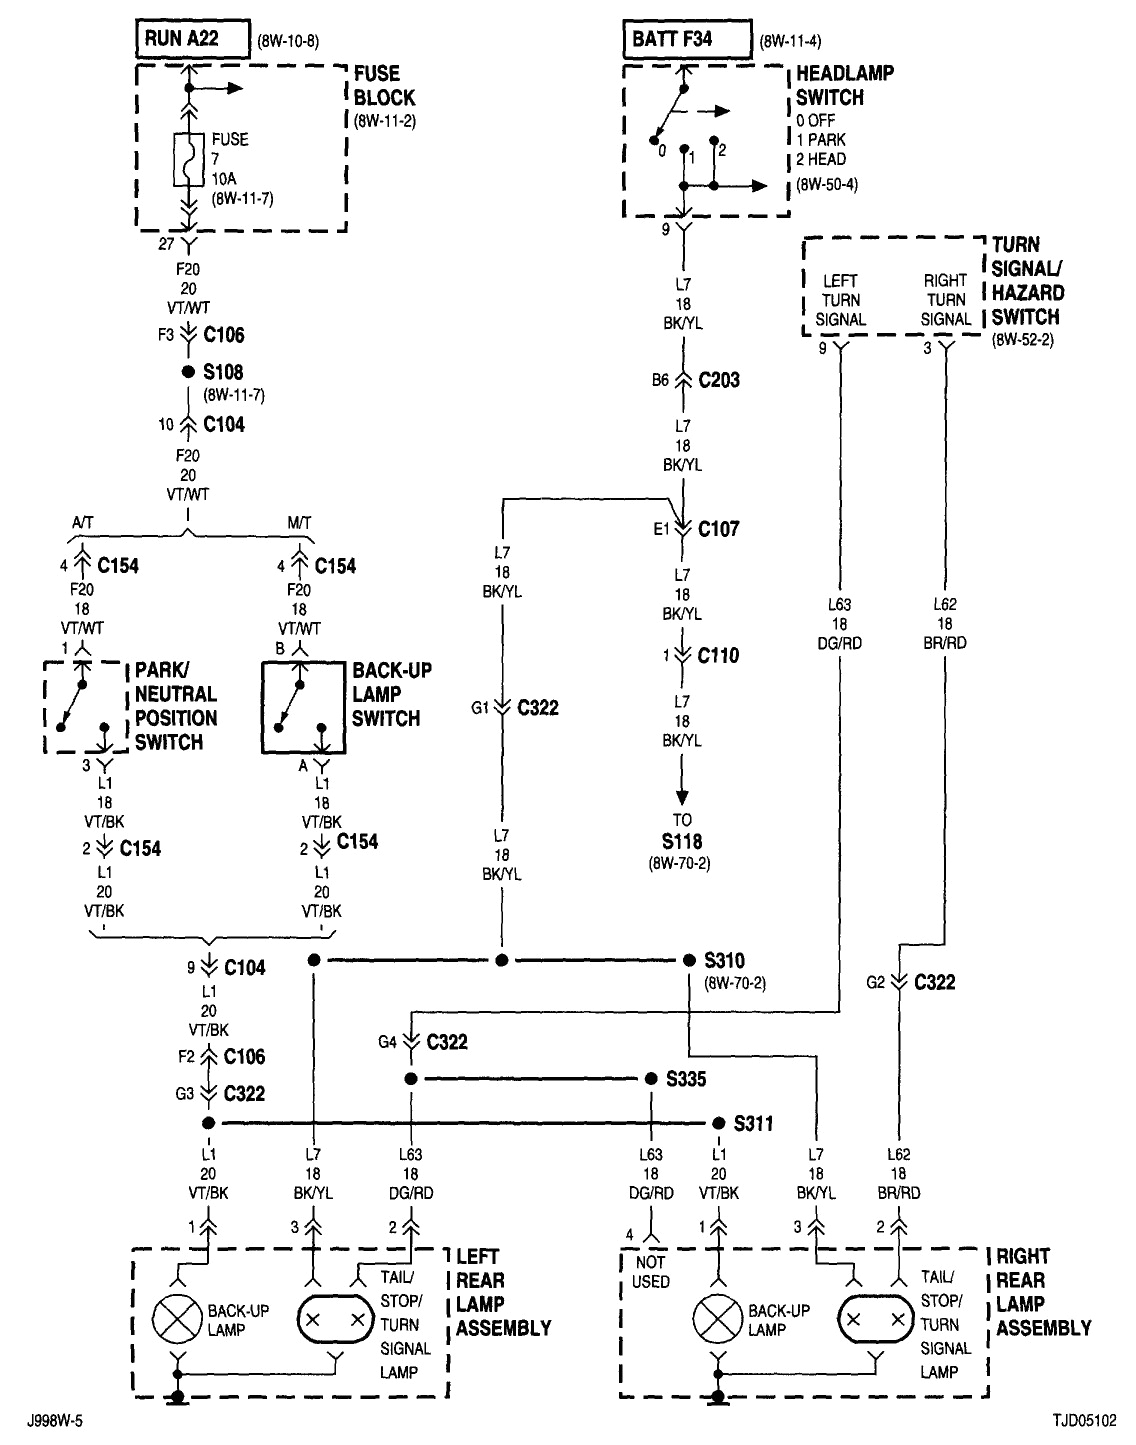 2004 jeep grand cherokee tail light wiring diagram awesome jeep cherokee radio wiring diagram with grand and wrangler starter of 2004 jeep grand cherokee tail light wiring diagram gif